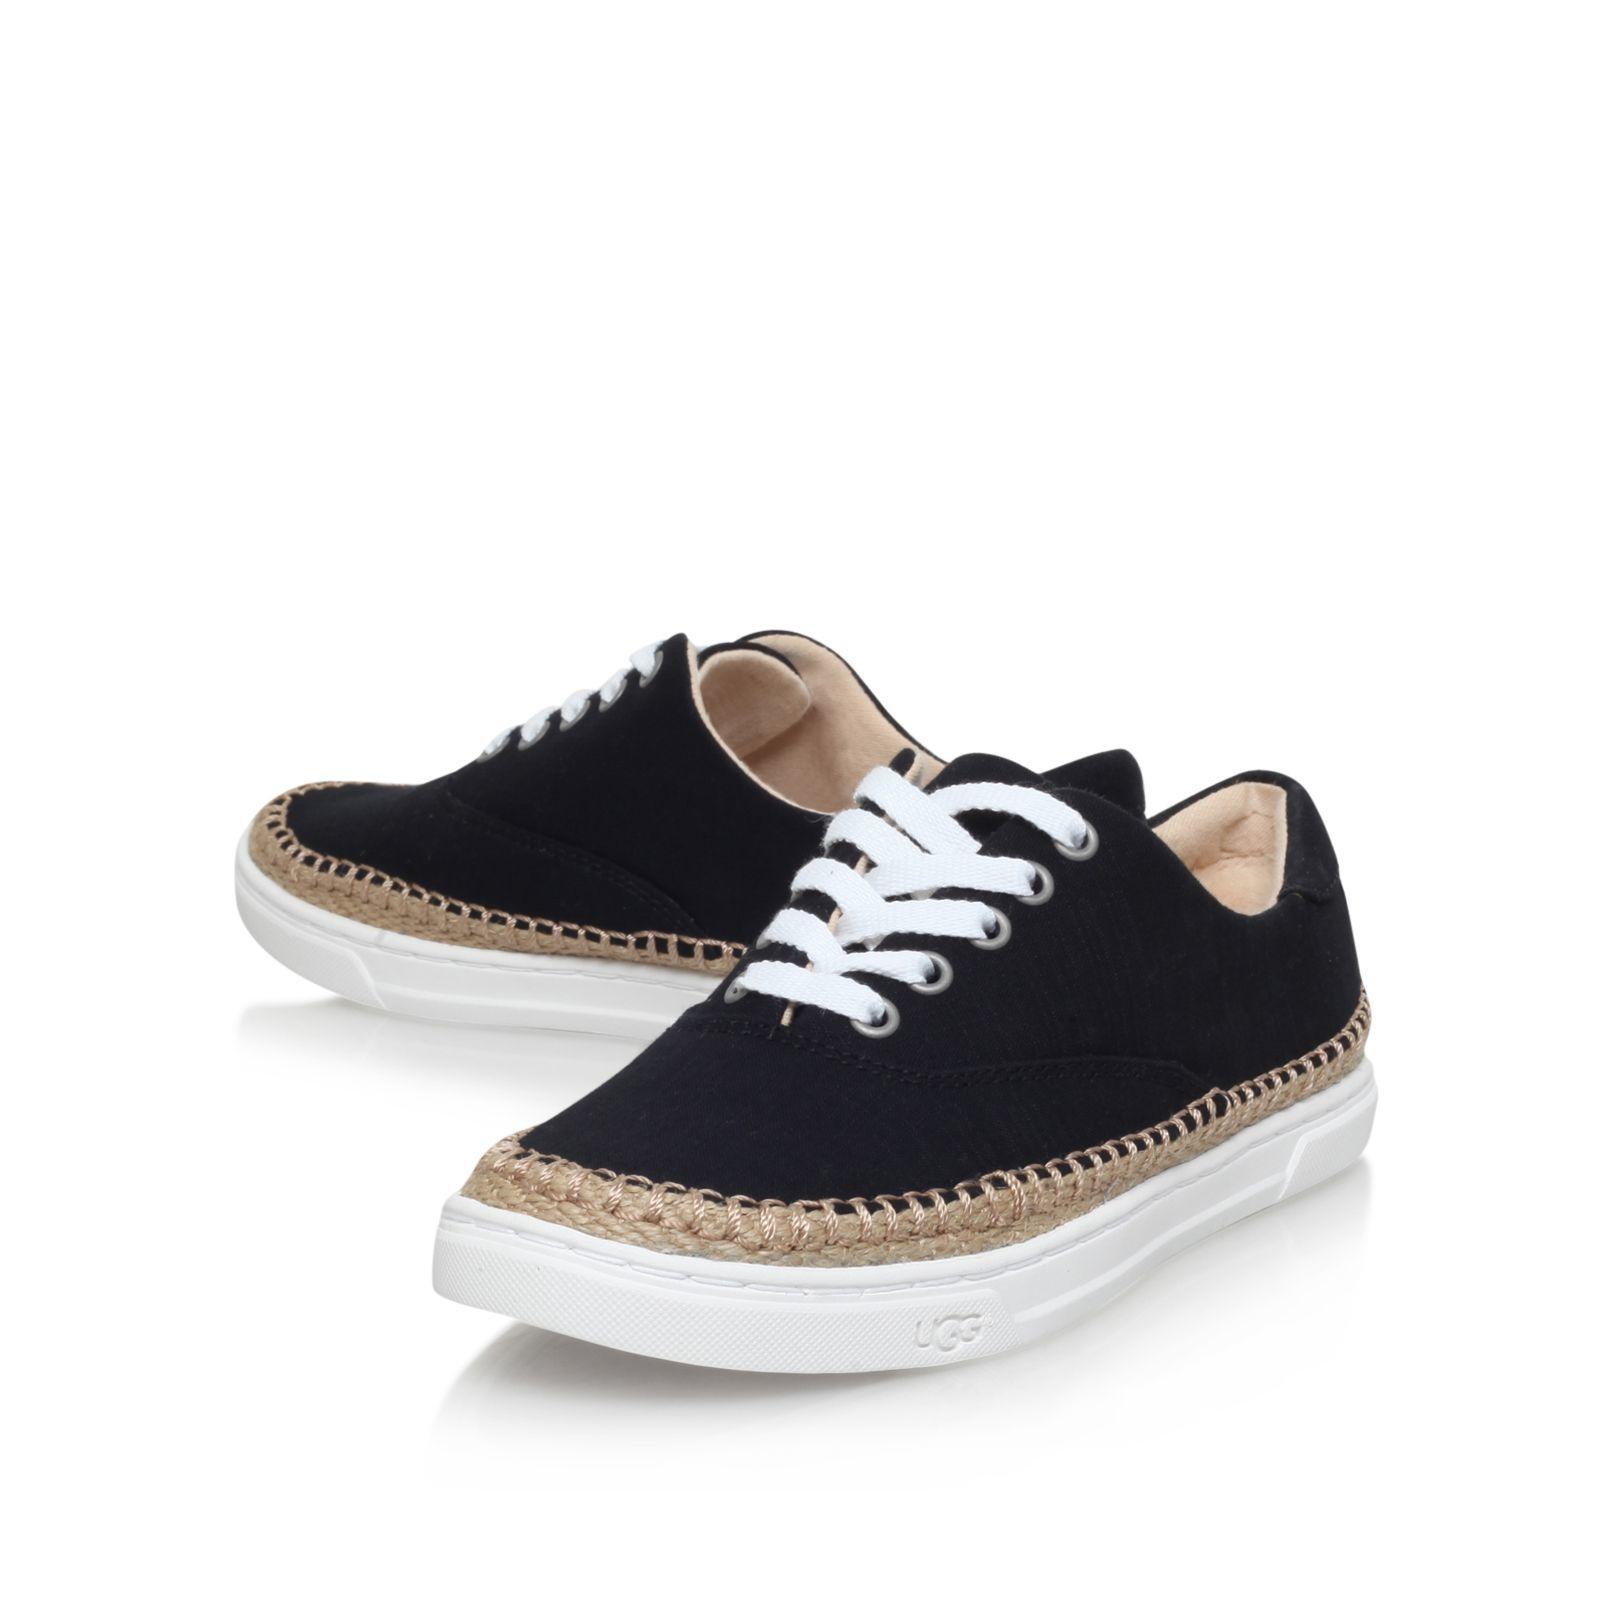 f0b948e4819 Womens Ugg Canvas Sneakers - cheap watches mgc-gas.com